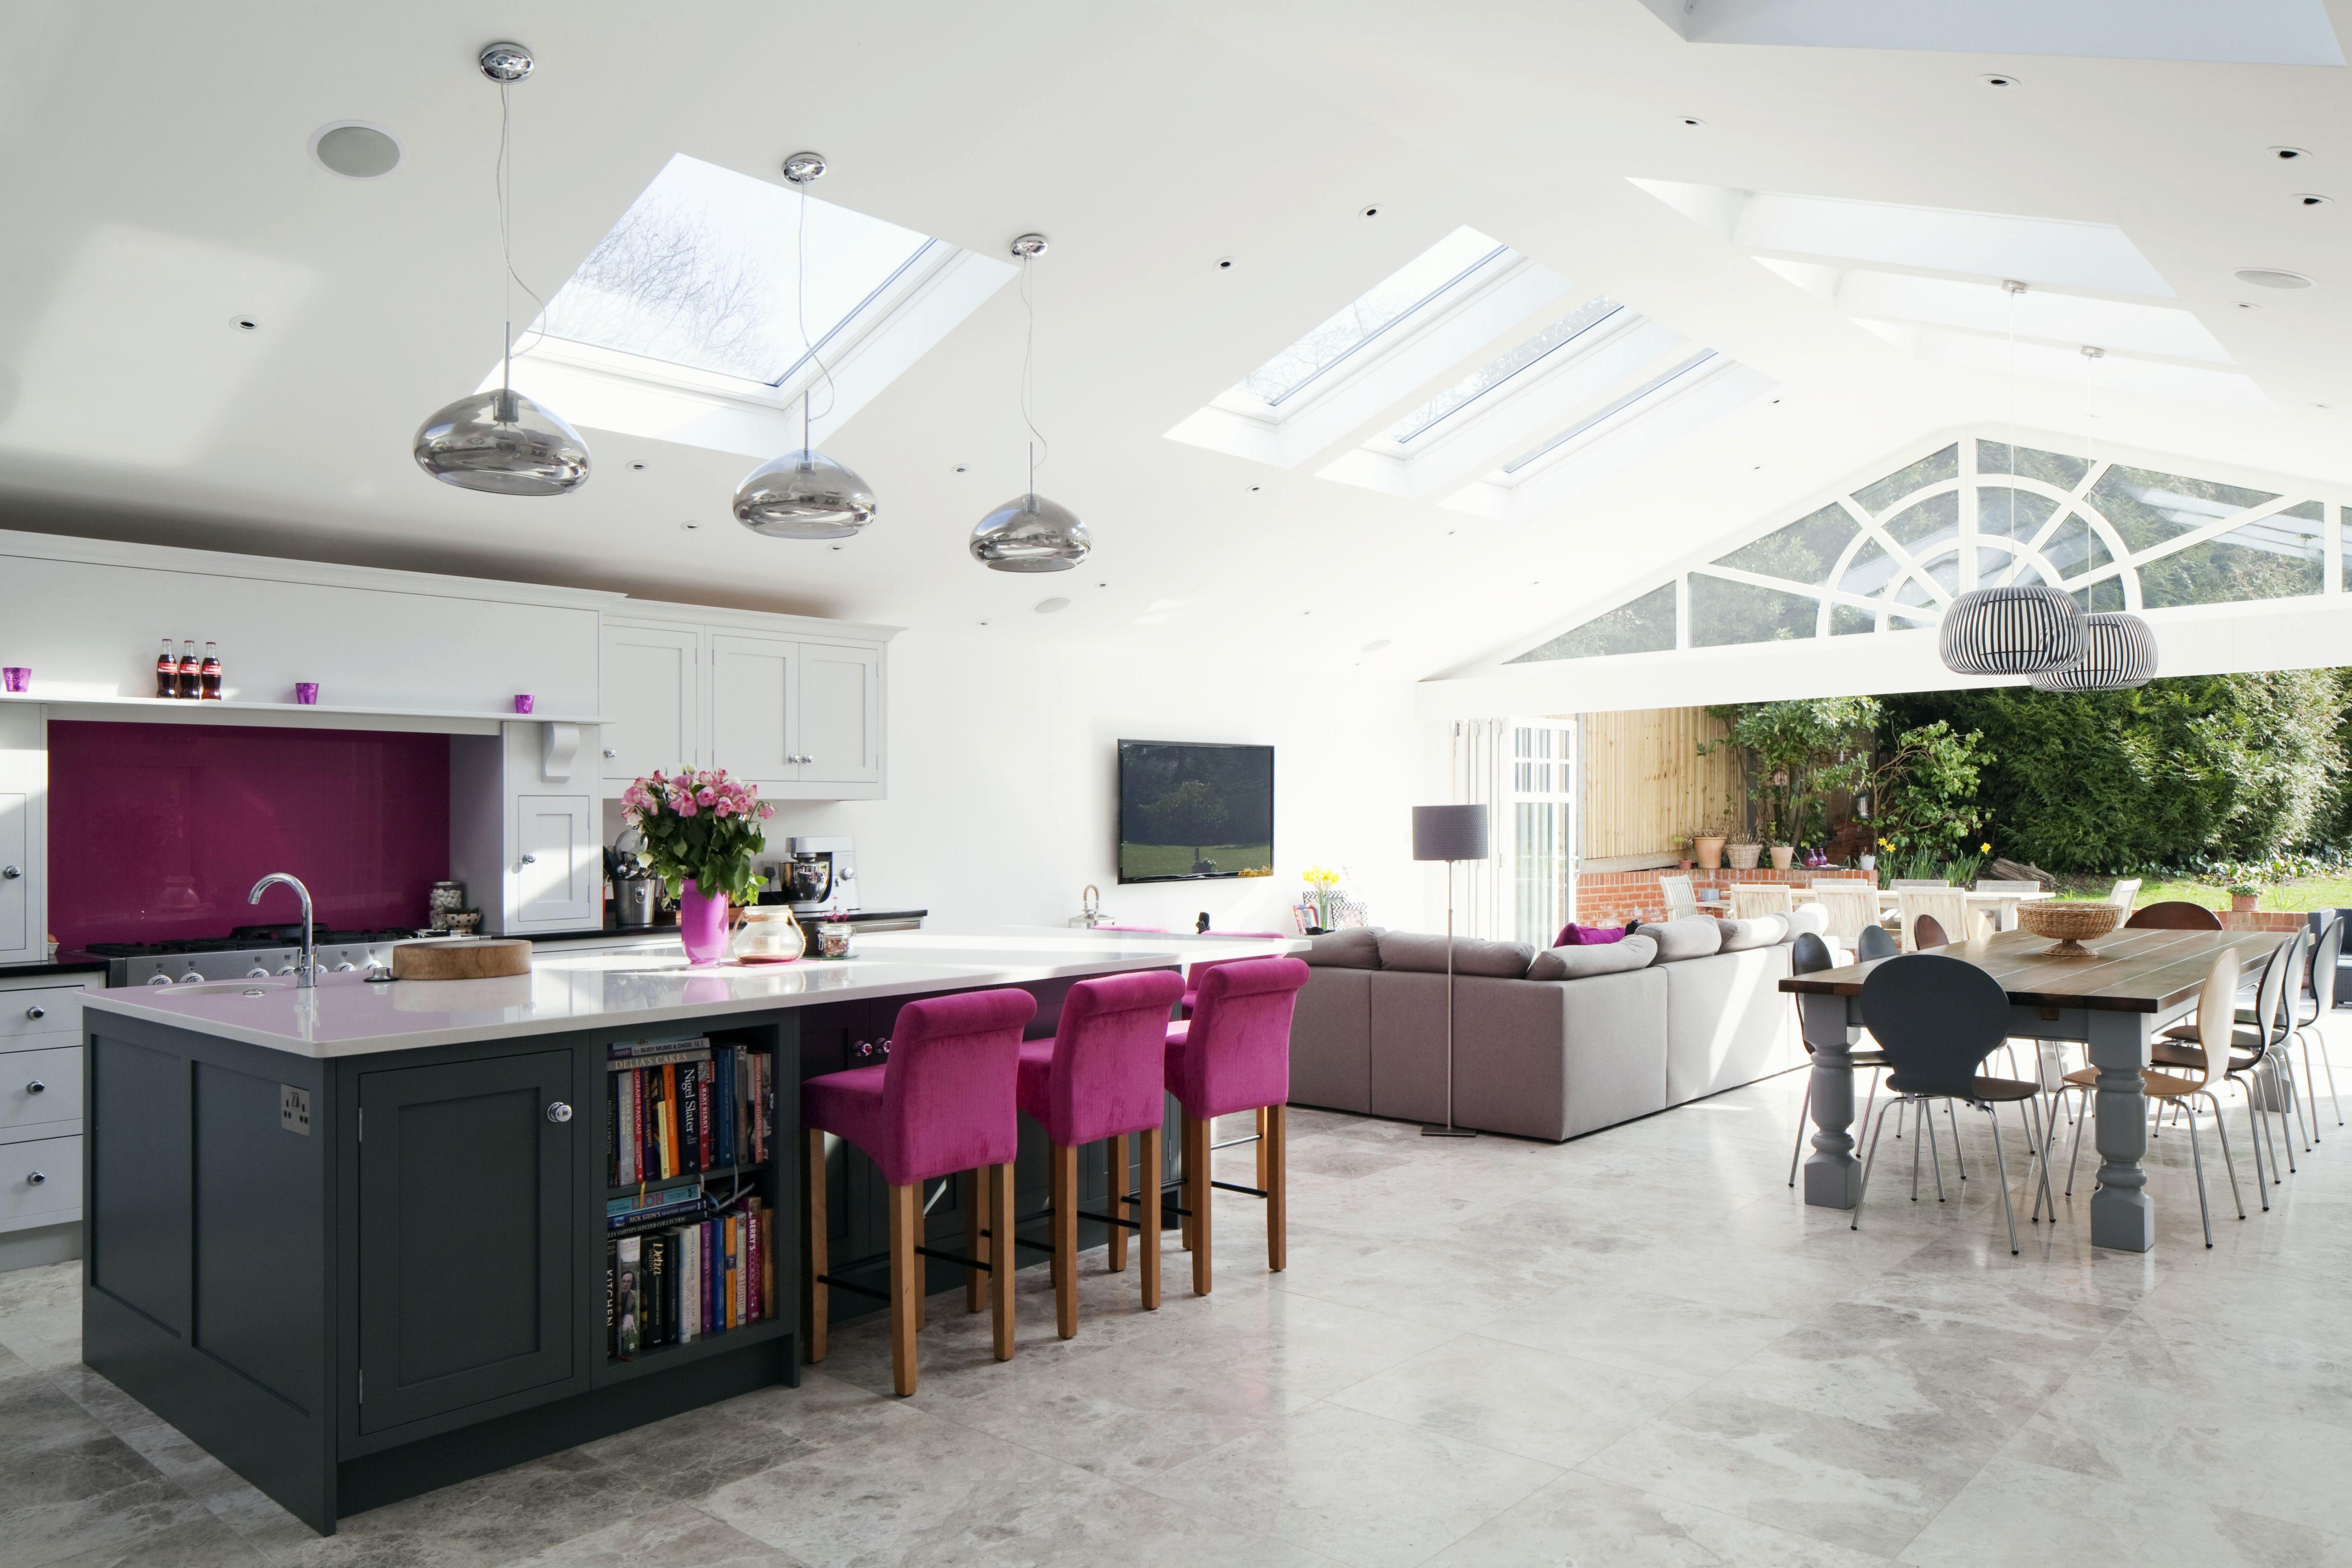 7 Awesome Big Open Kitchen Design Ideas For Cozy Cooking In 2020 Kitchen Layout Kitchen Island Storage Large Kitchen Island